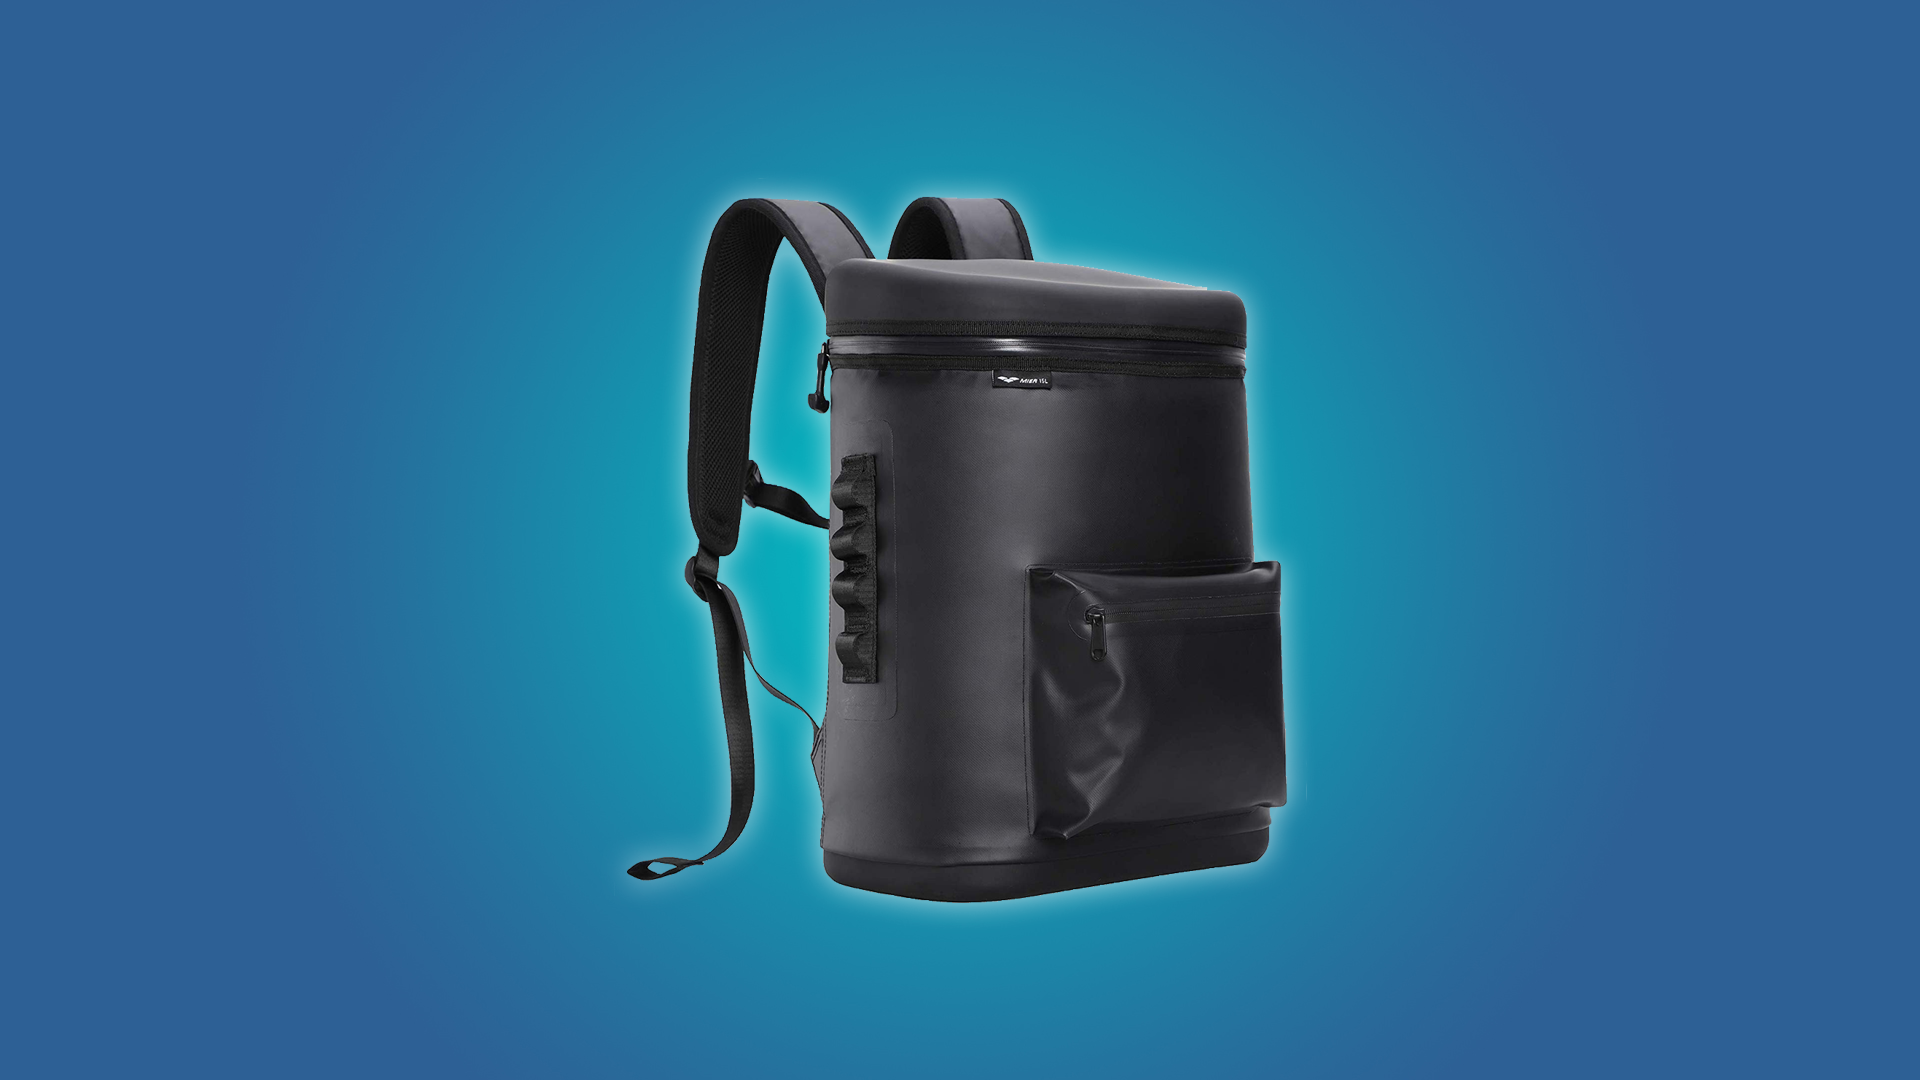 The MIER 9qt Backpack Cooler